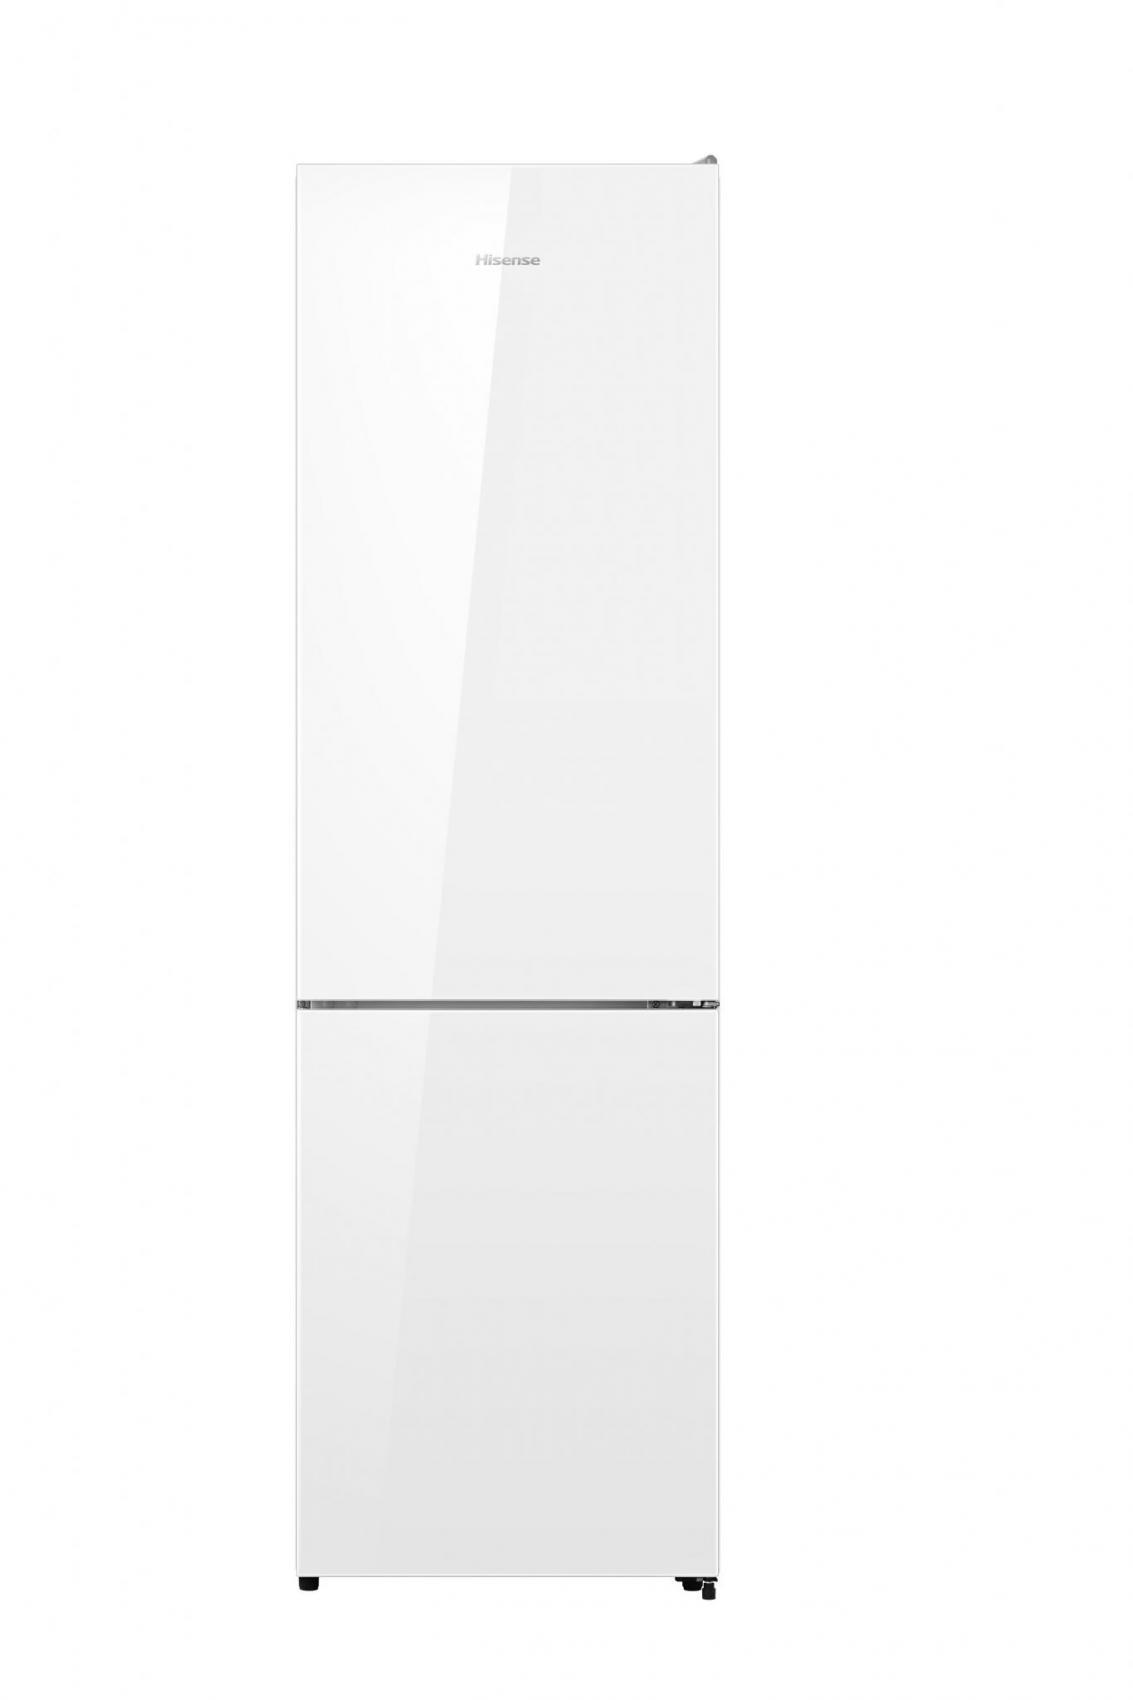 combi hisense rb438n4gx3 cristal blanco 2.00m